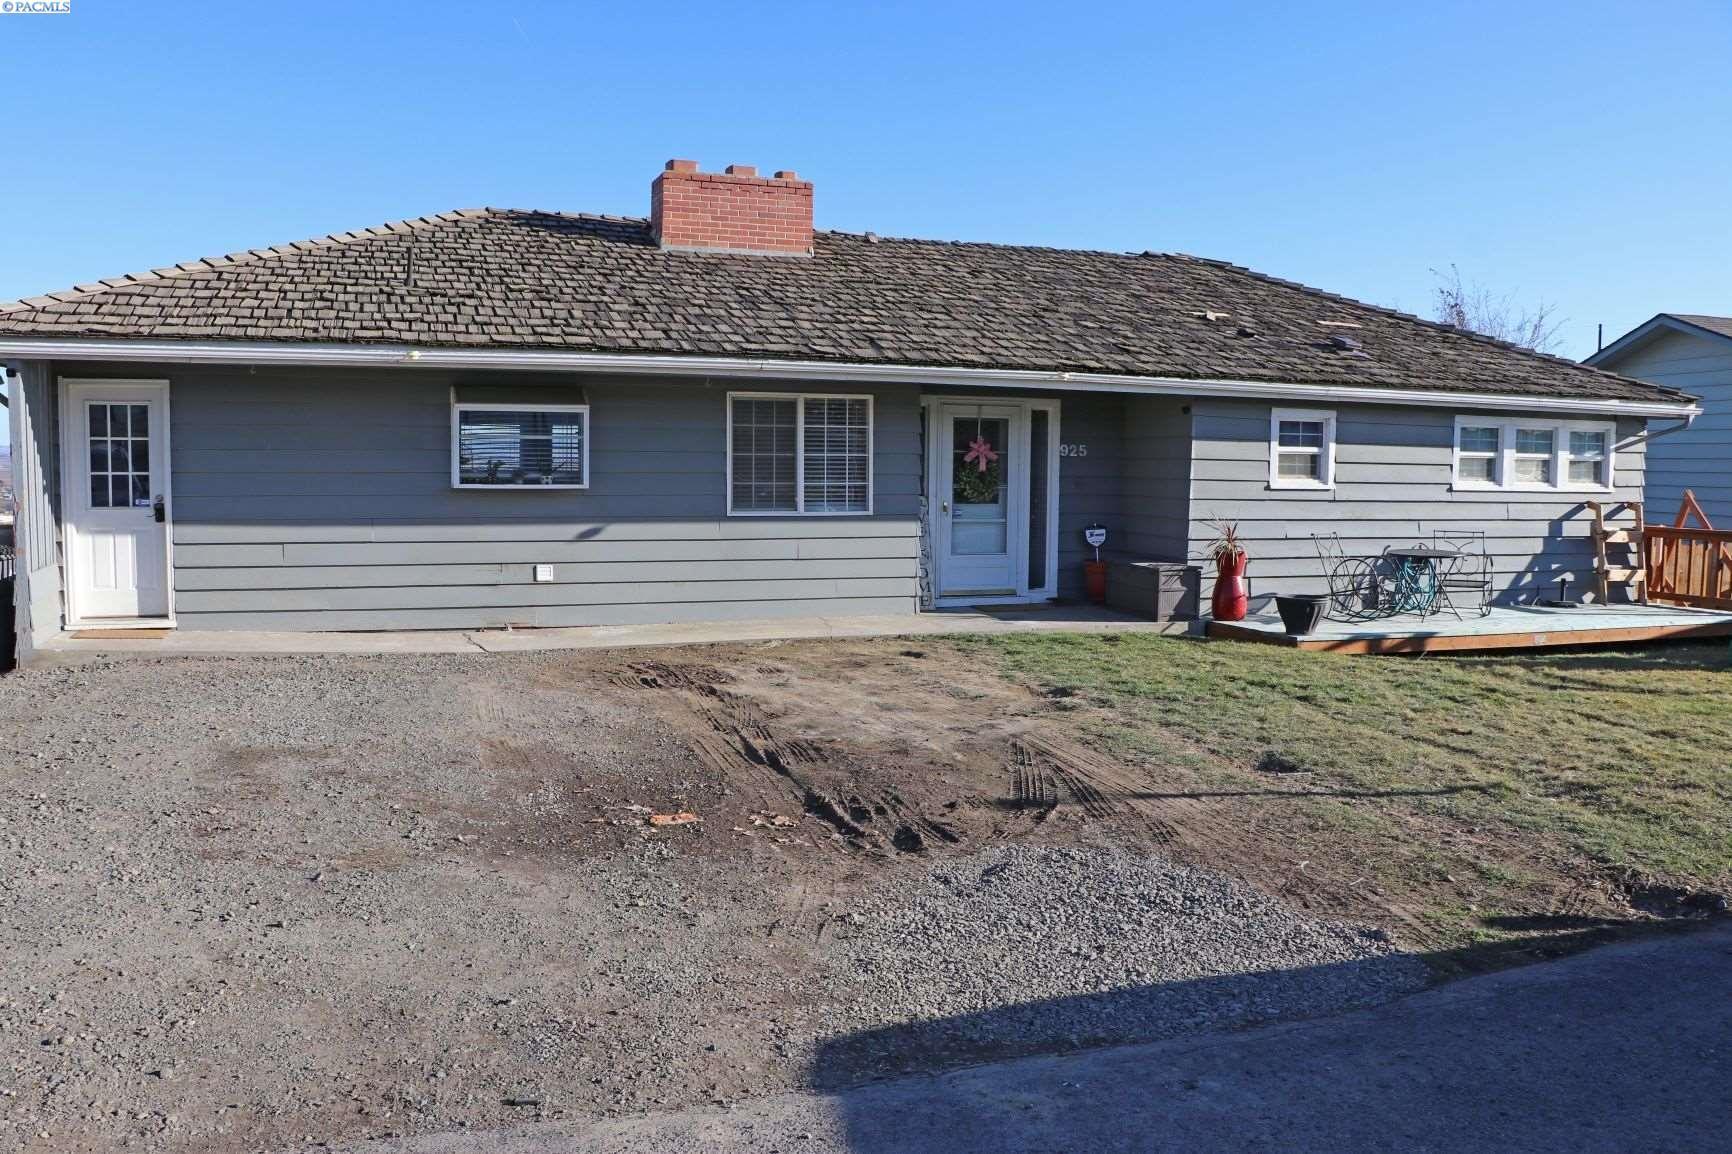 Photo of 925 Grending Ave, Sunnyside, WA 98944 (MLS # 251959)